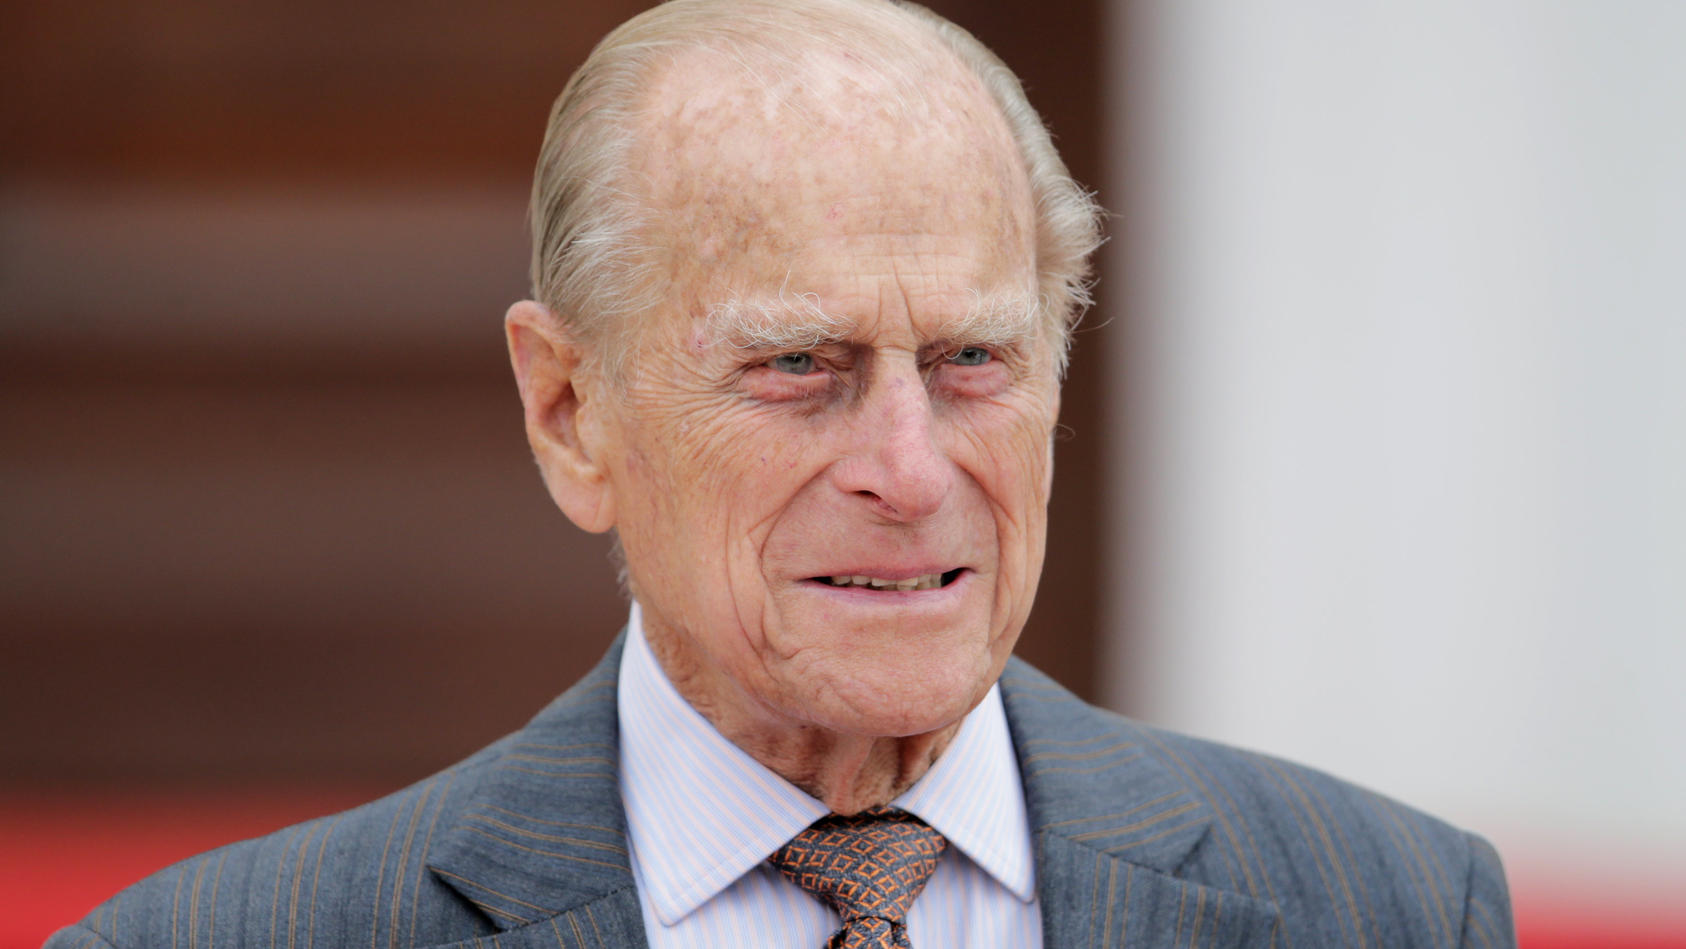 Prinz Philip ist im April 2021 gestorben